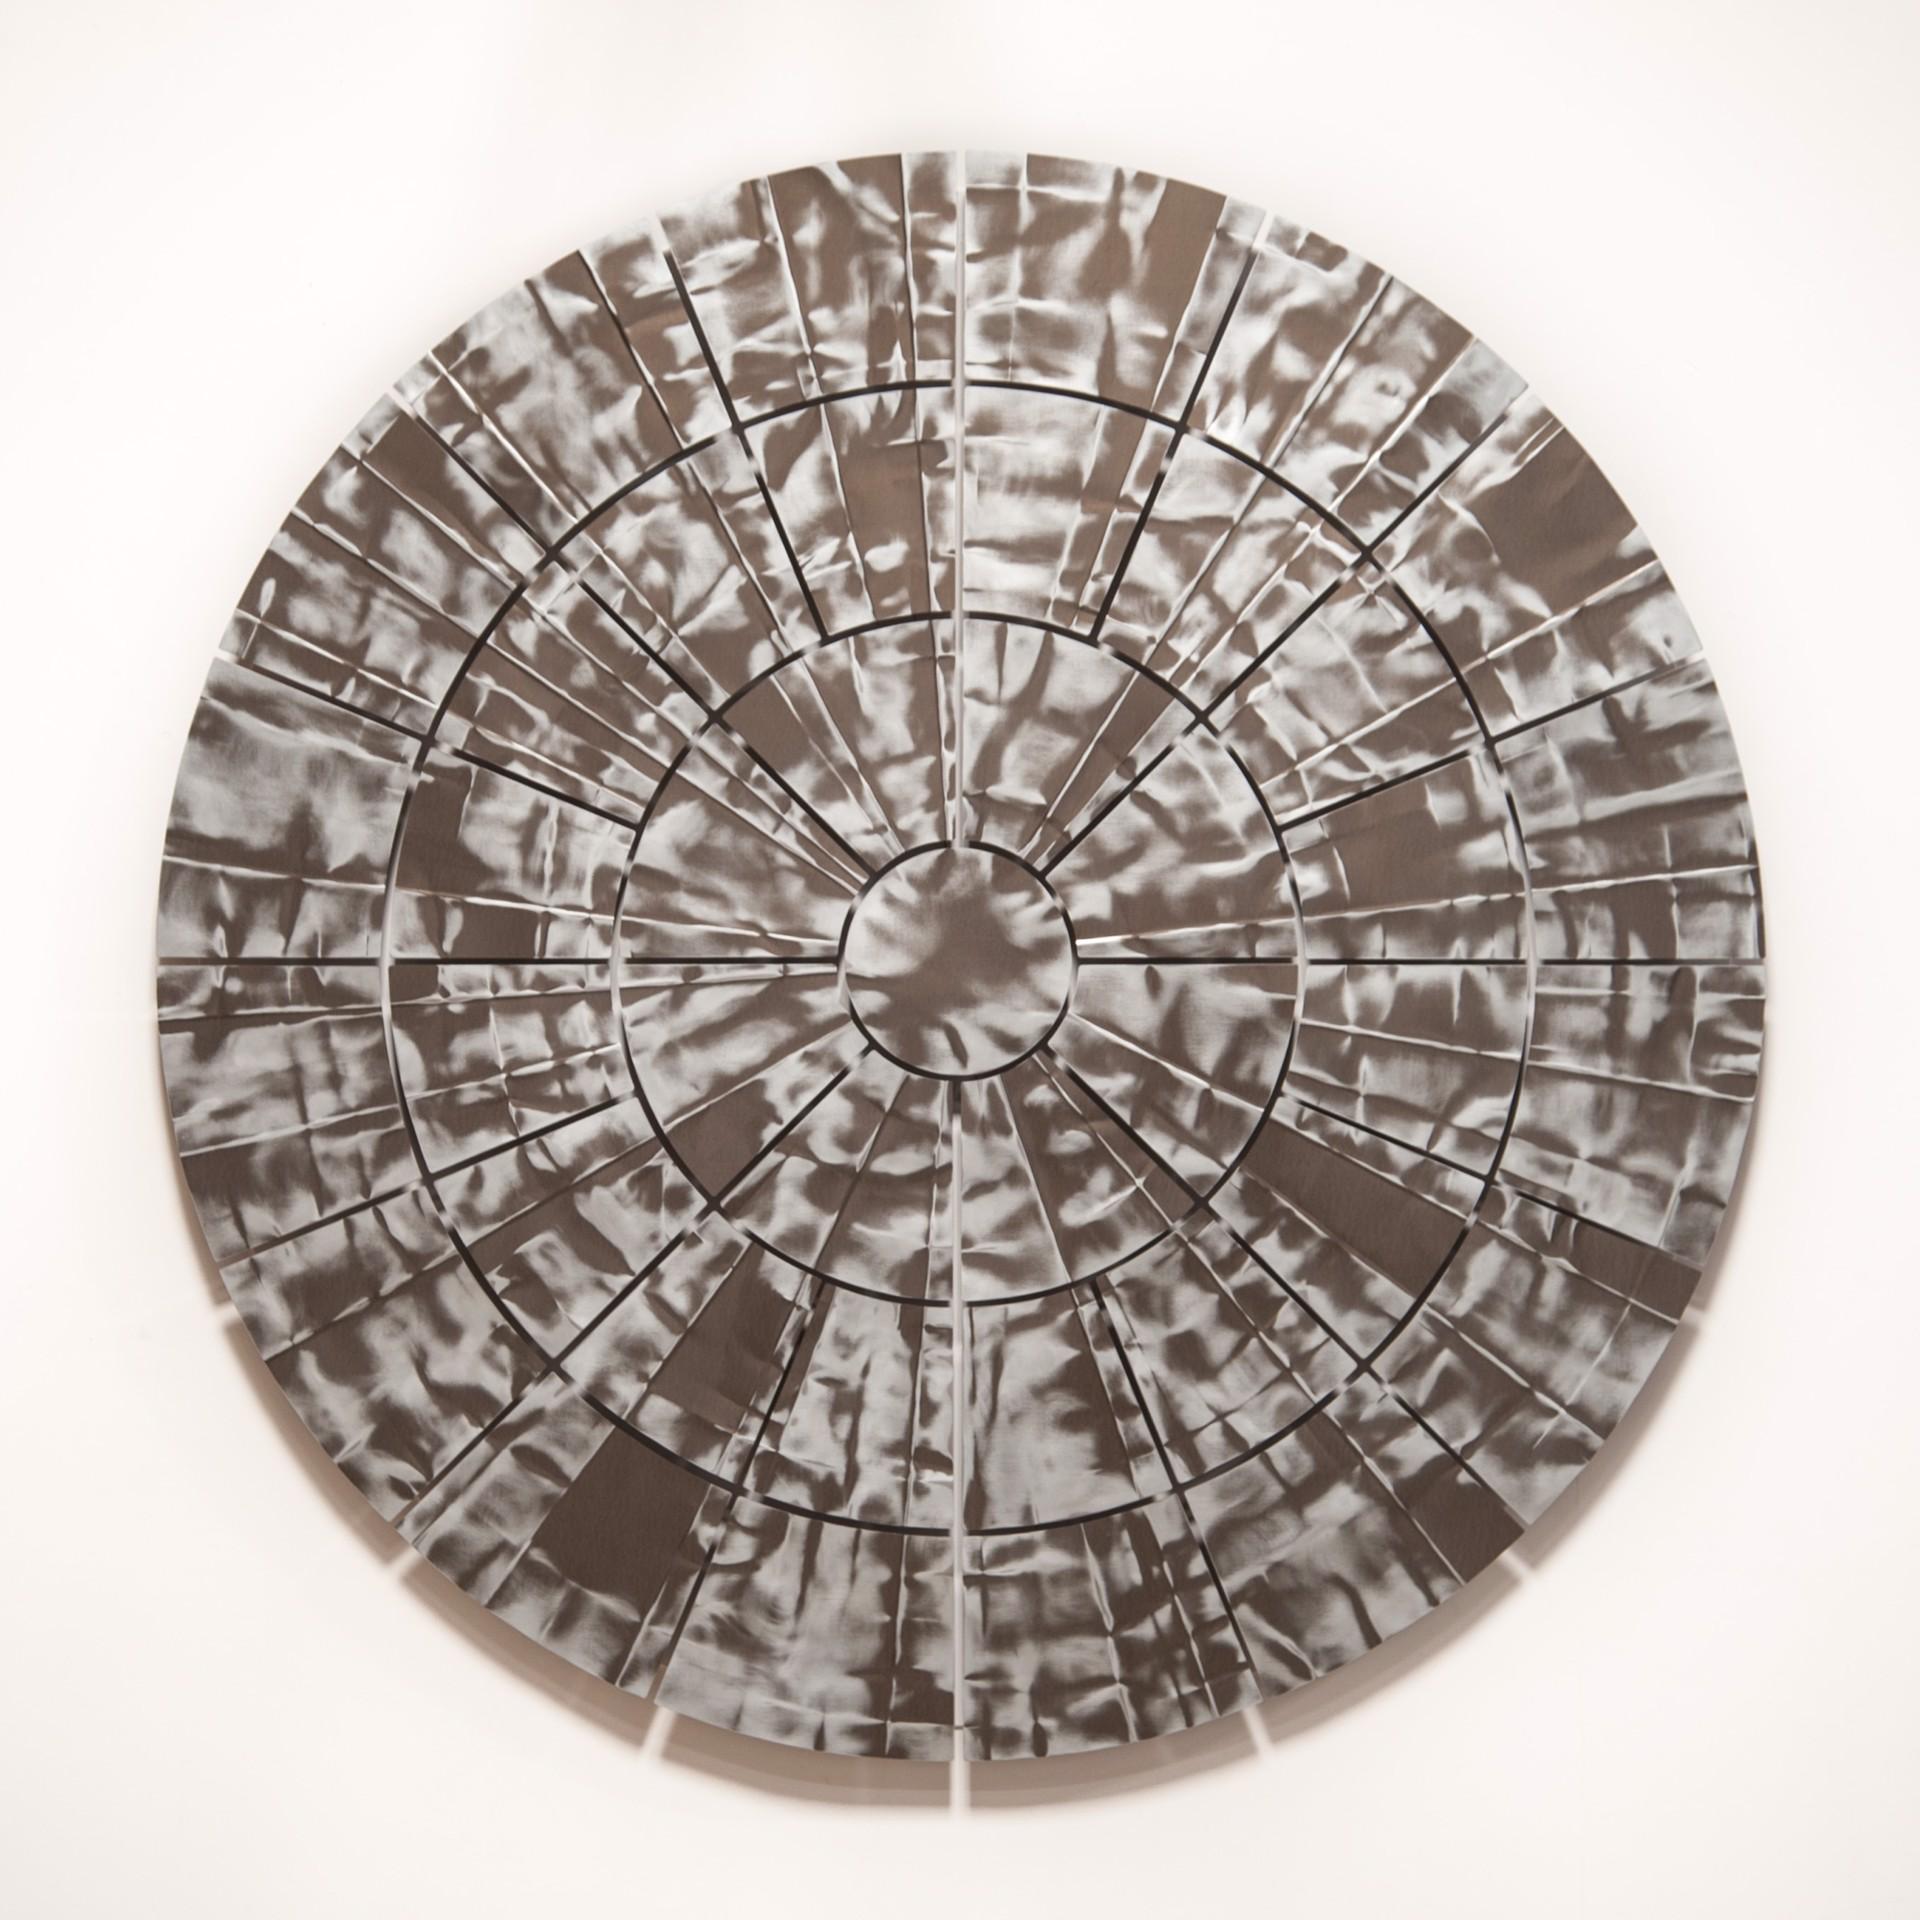 Oscillator by Devon Christopher Moore